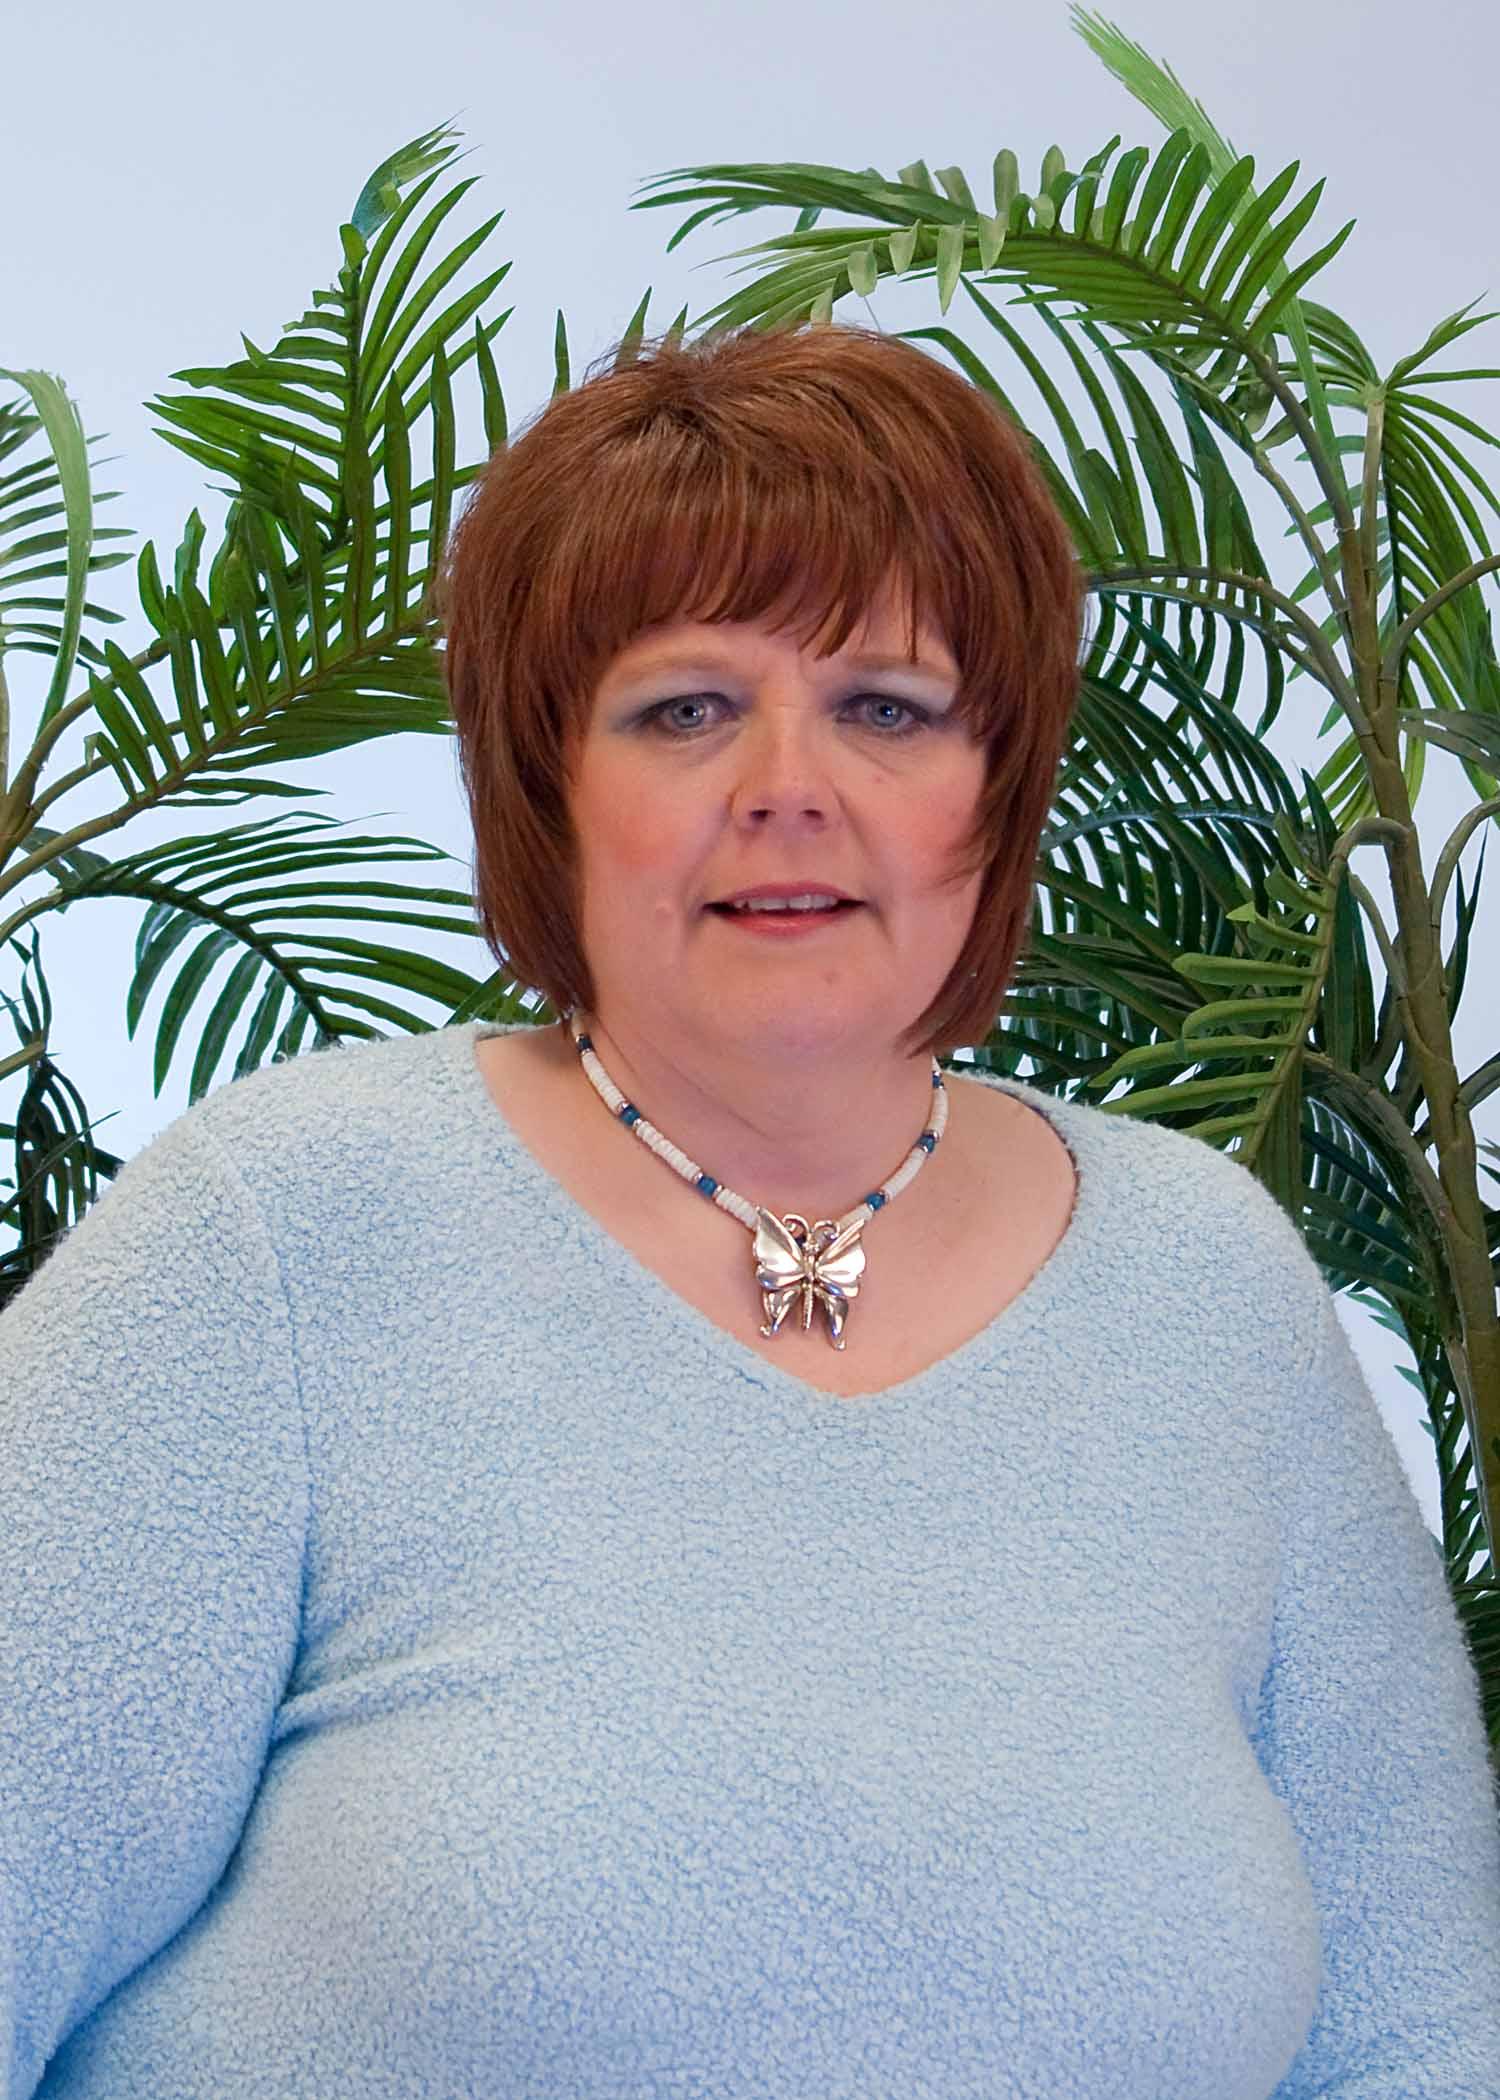 Ms. Helen Ritchie - Food Service Operations Coordinator & Health & Wellness